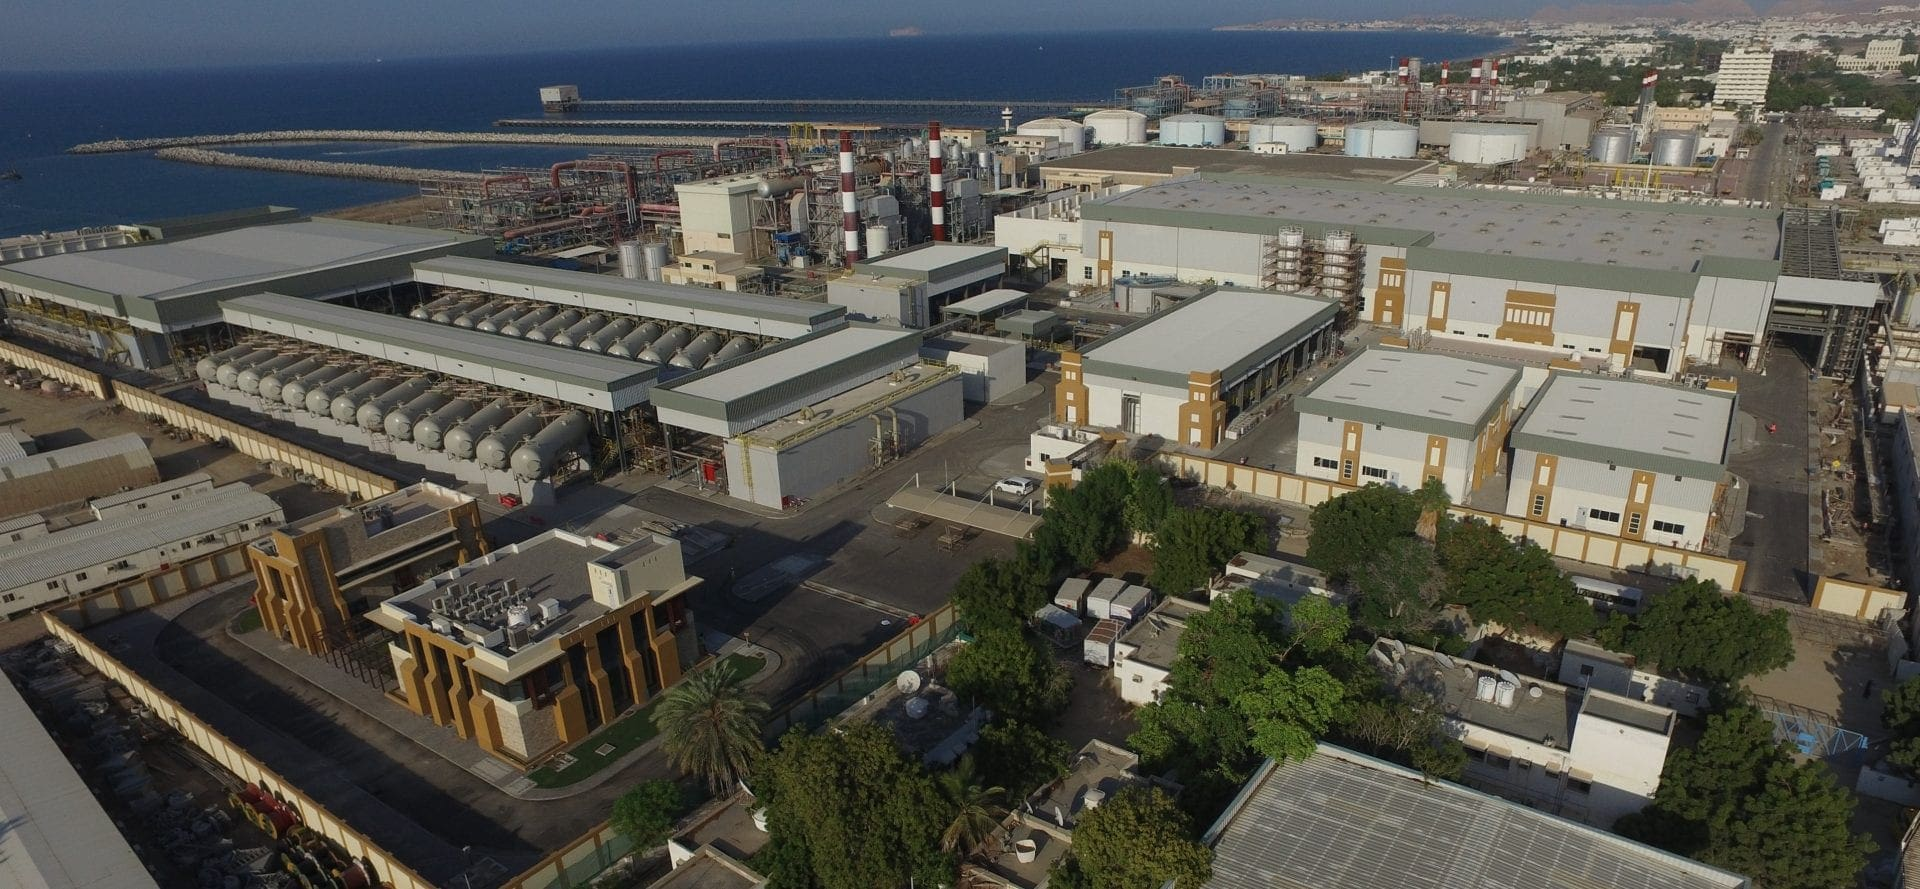 The Al Ghubrah desalination plant in Oman